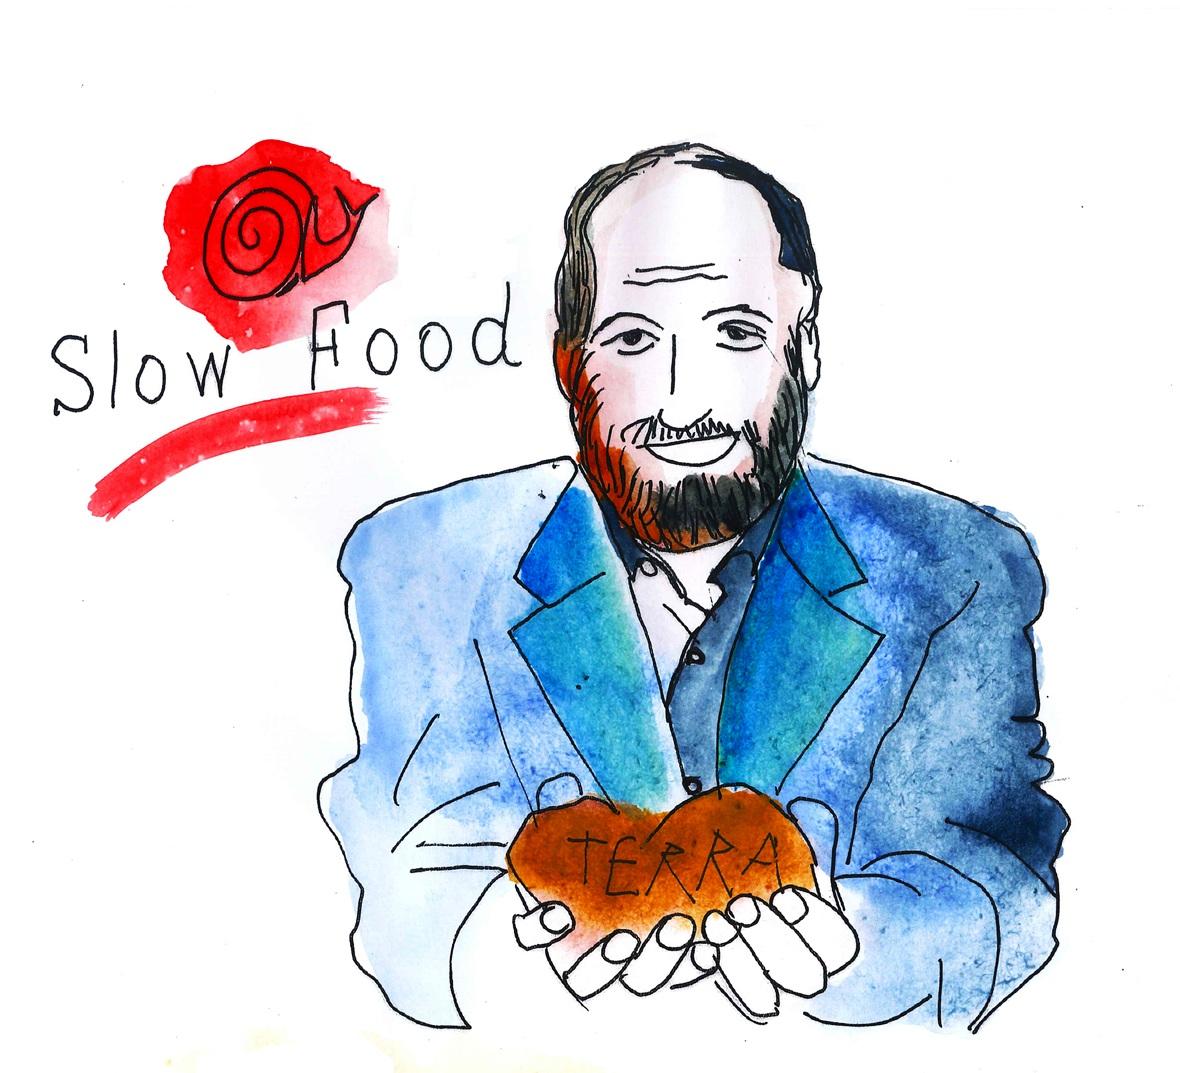 Slow+Food+founder+Carlo+Petrini+-+USED.jpg